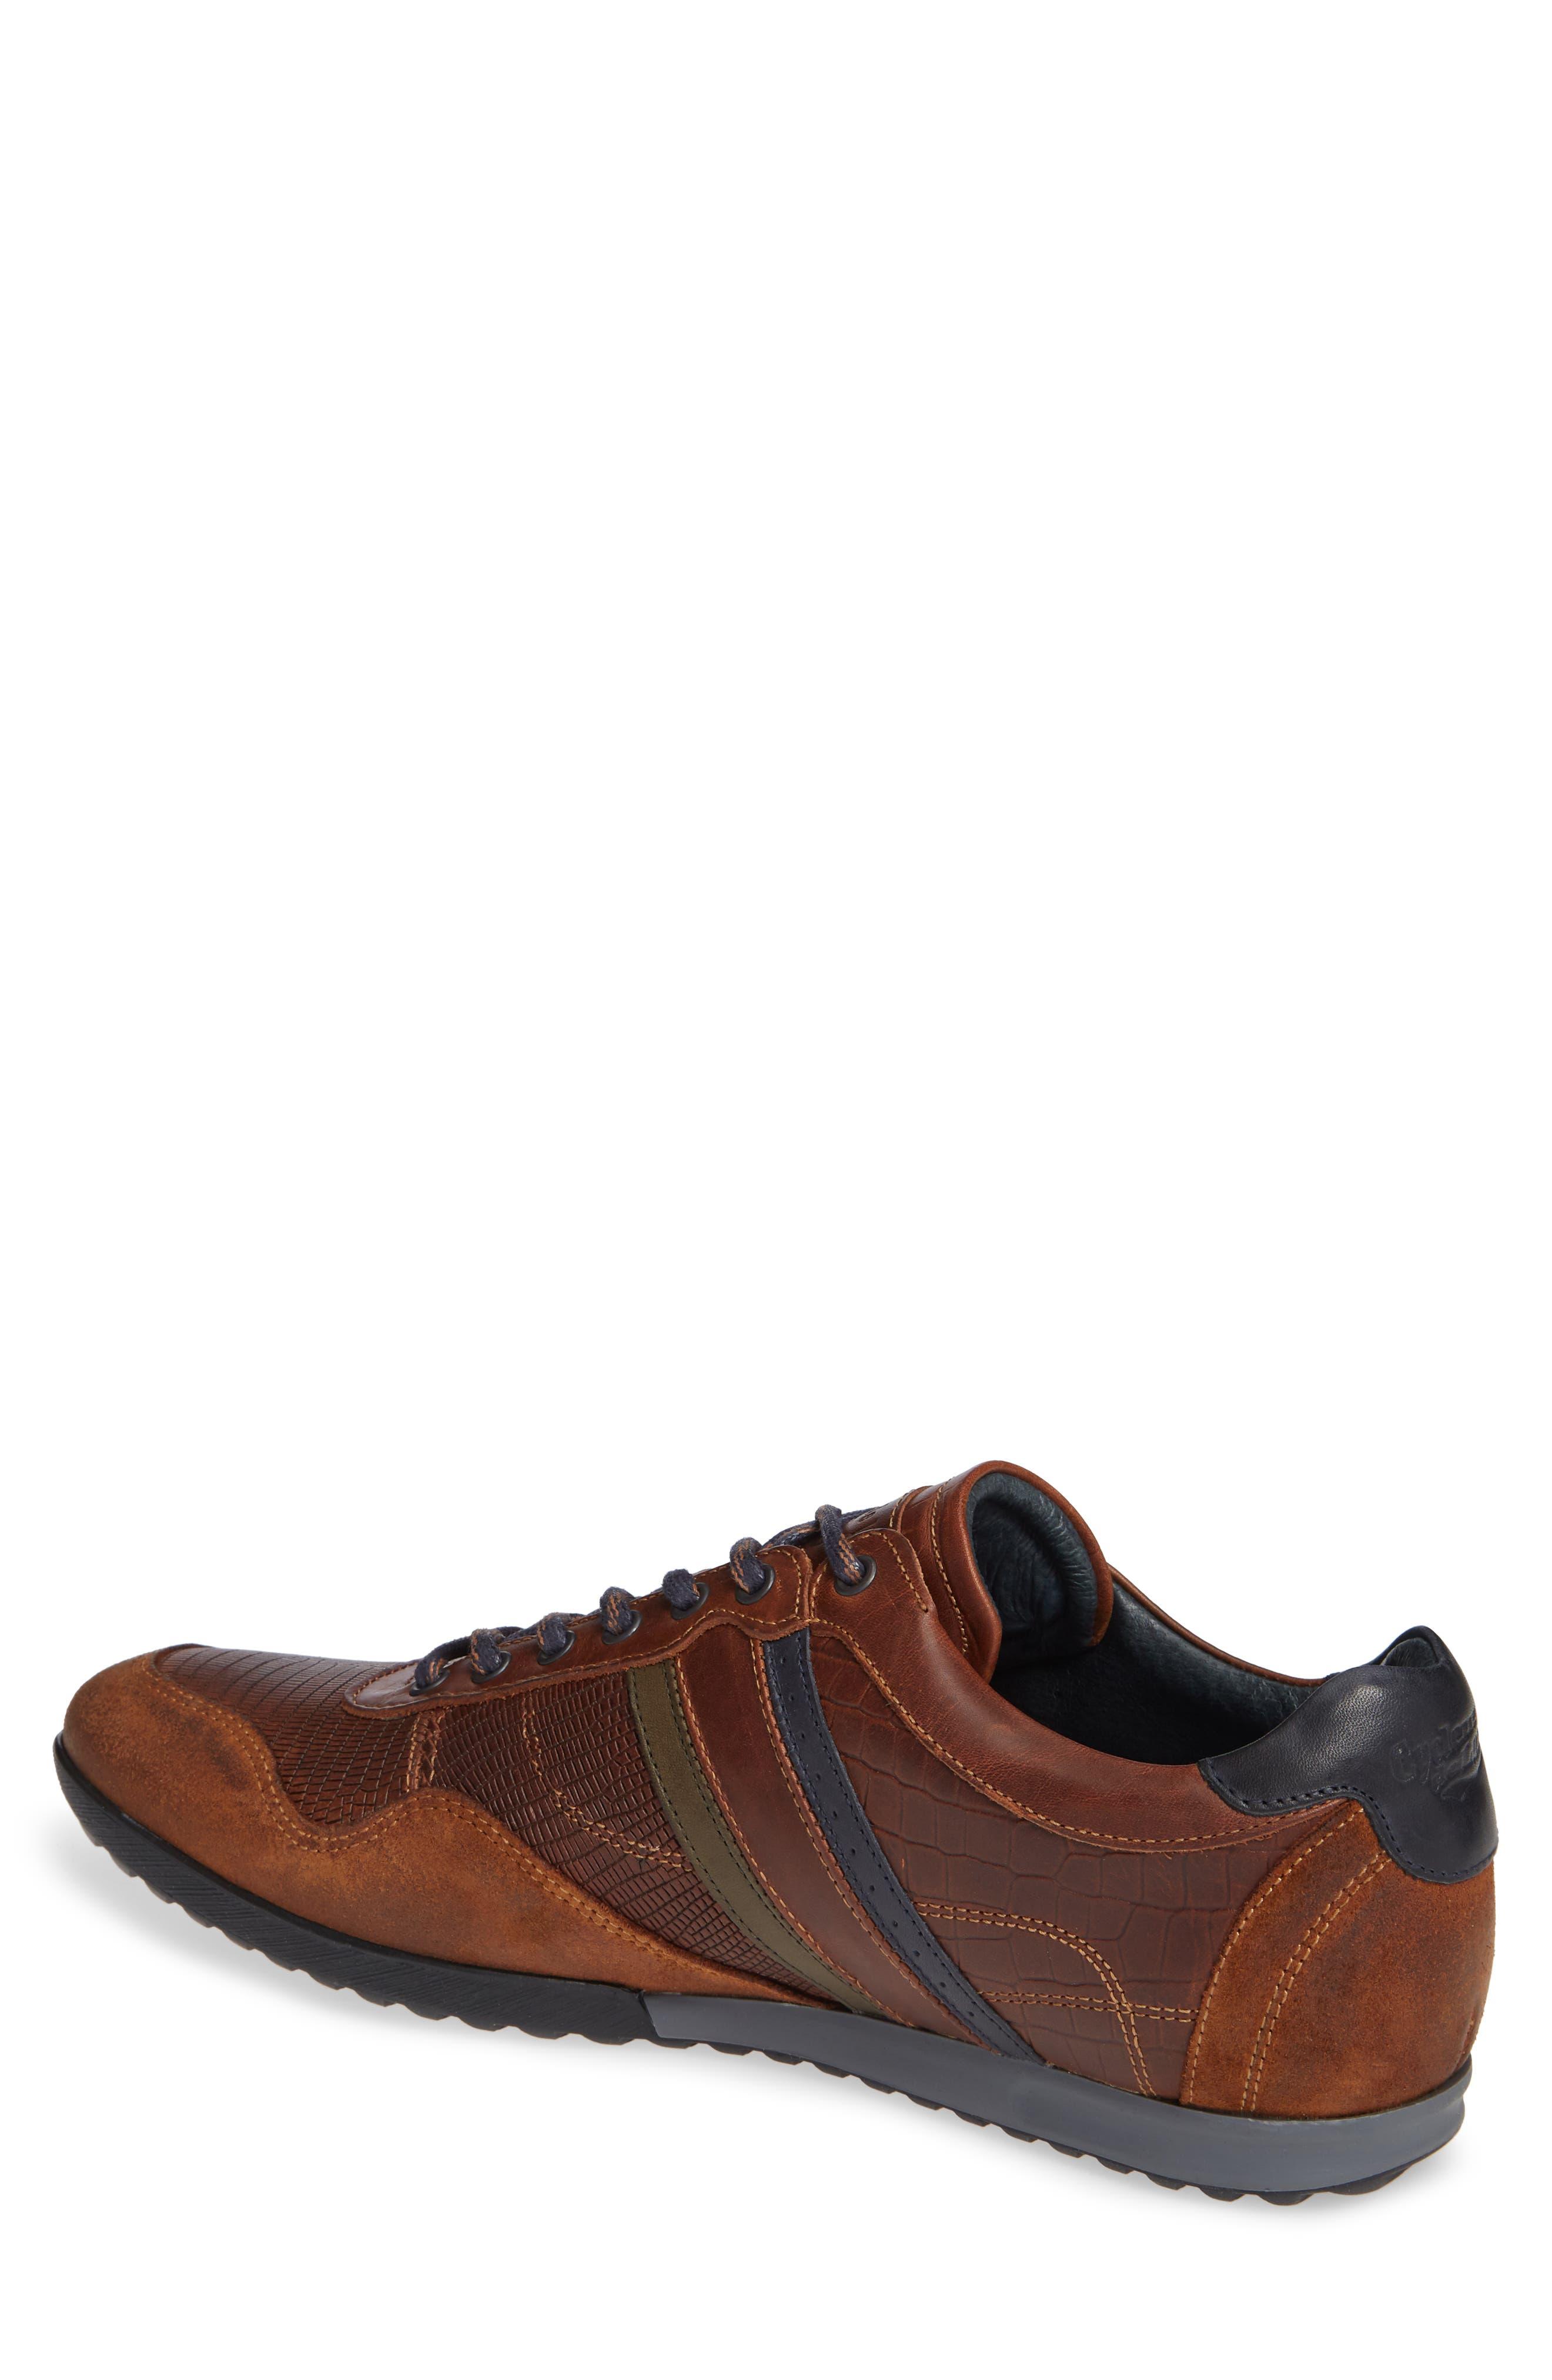 Crash Sneaker,                             Alternate thumbnail 2, color,                             COGNAC